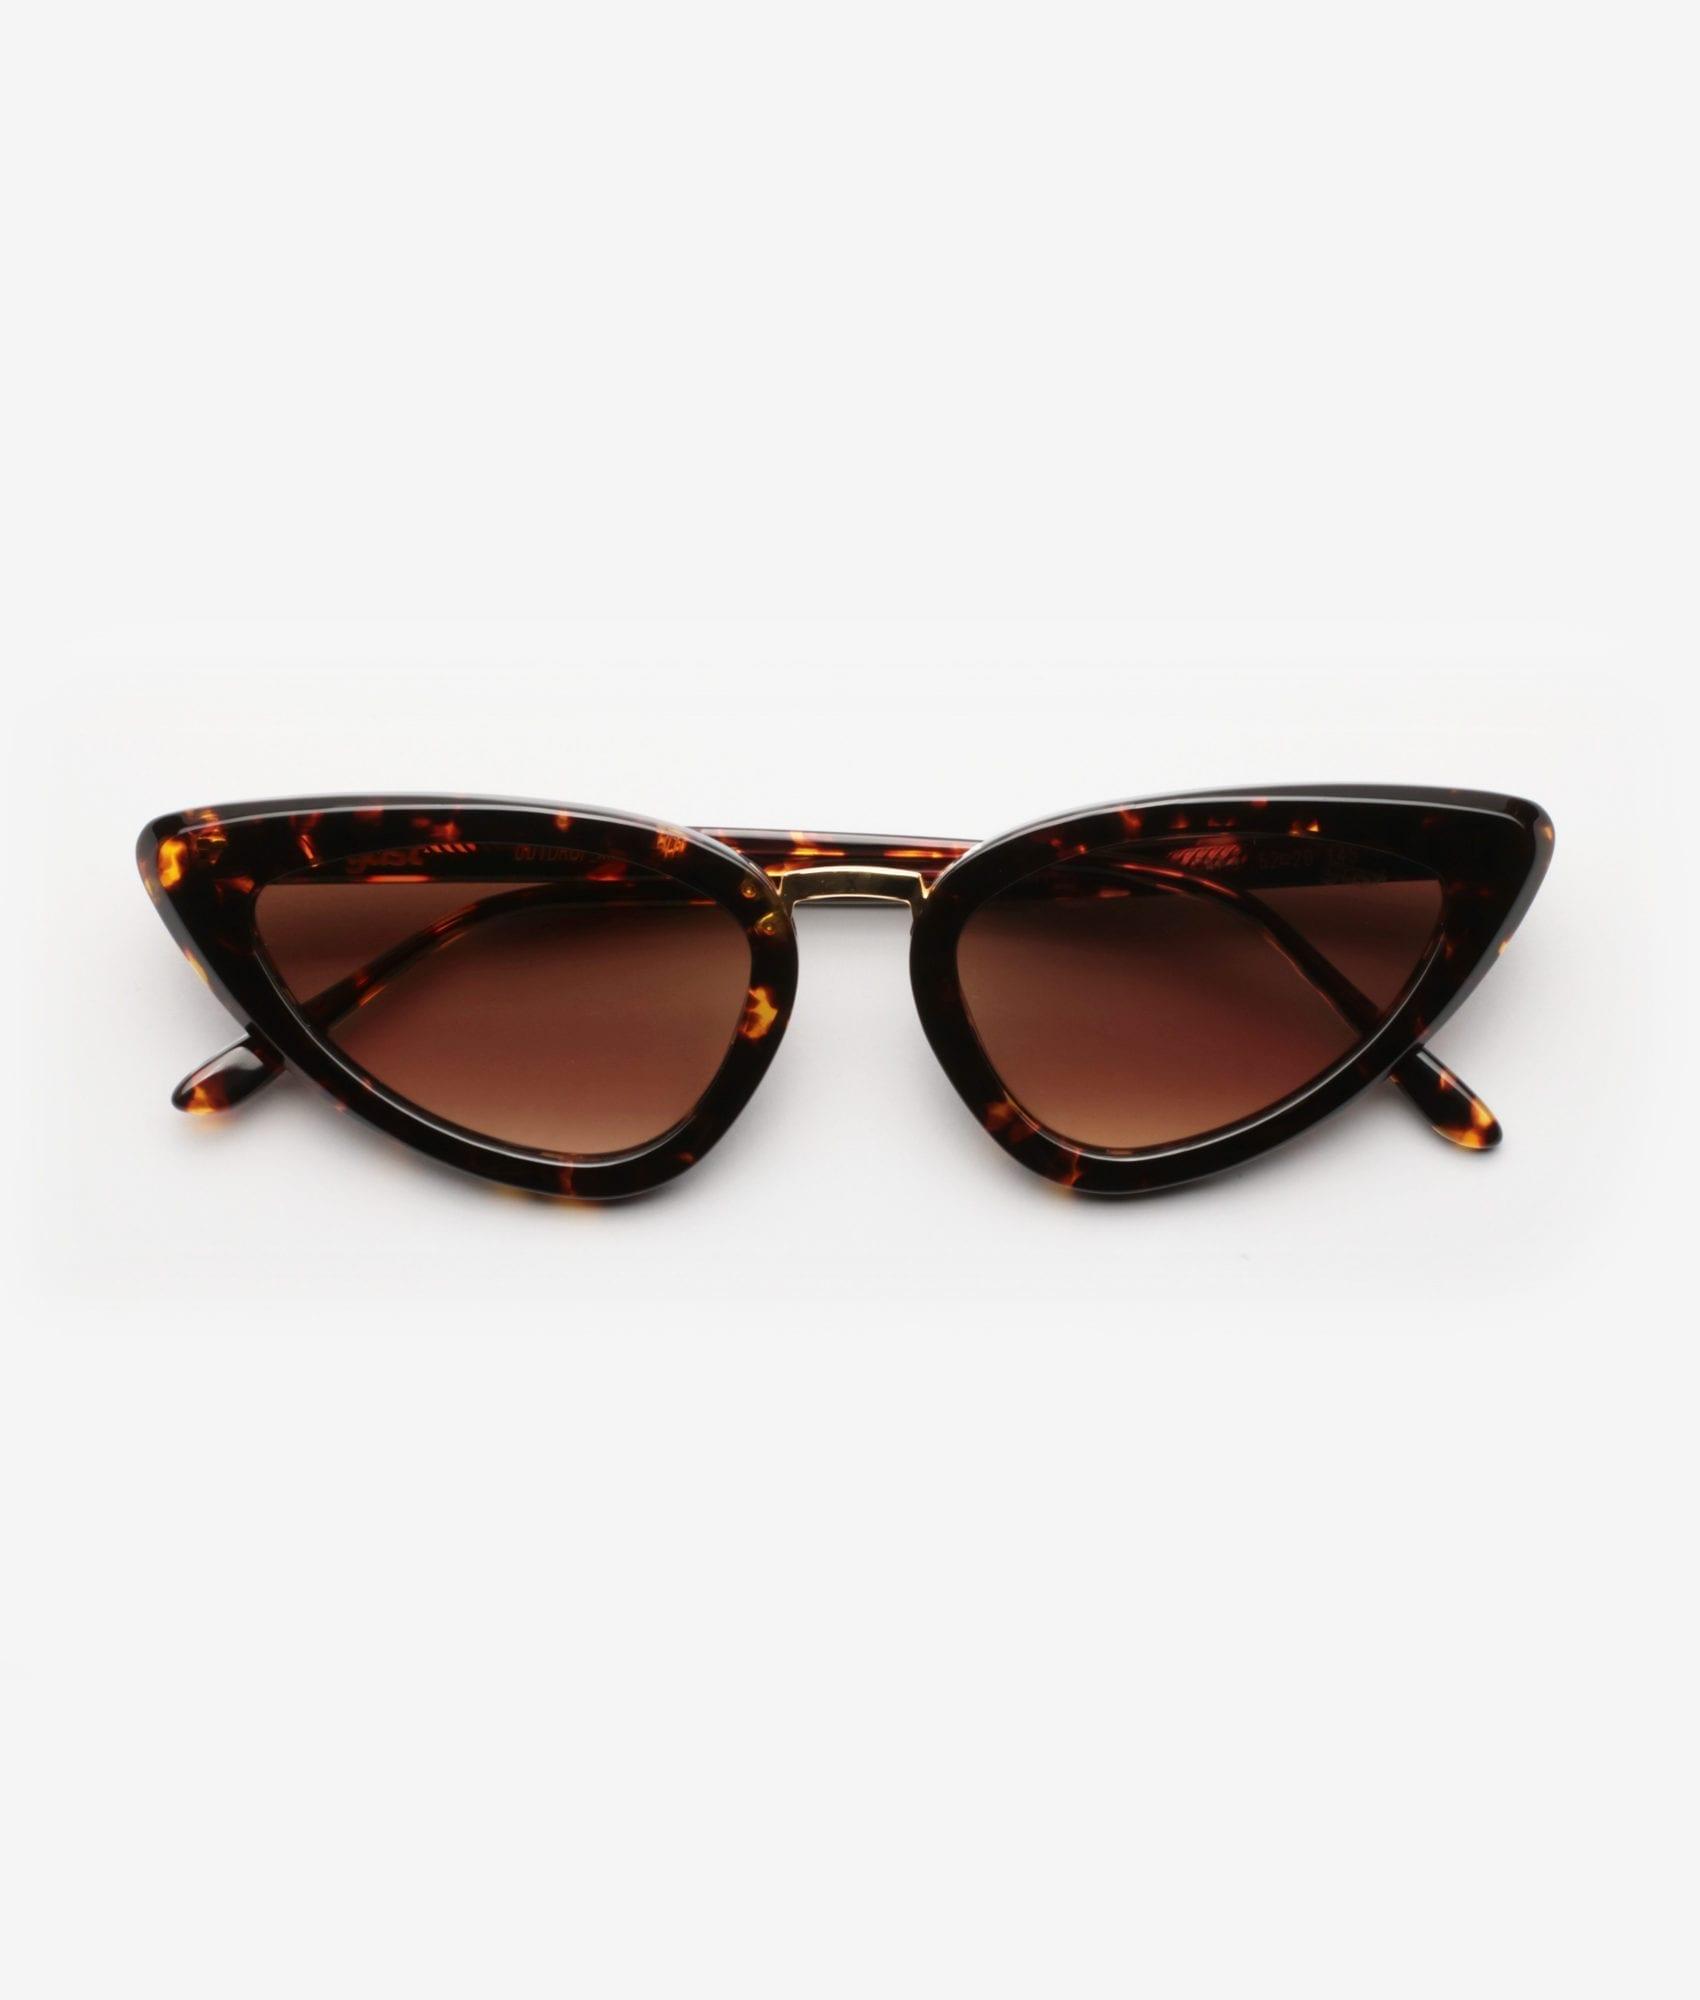 VENTI144 Havana Gast Sunglasses